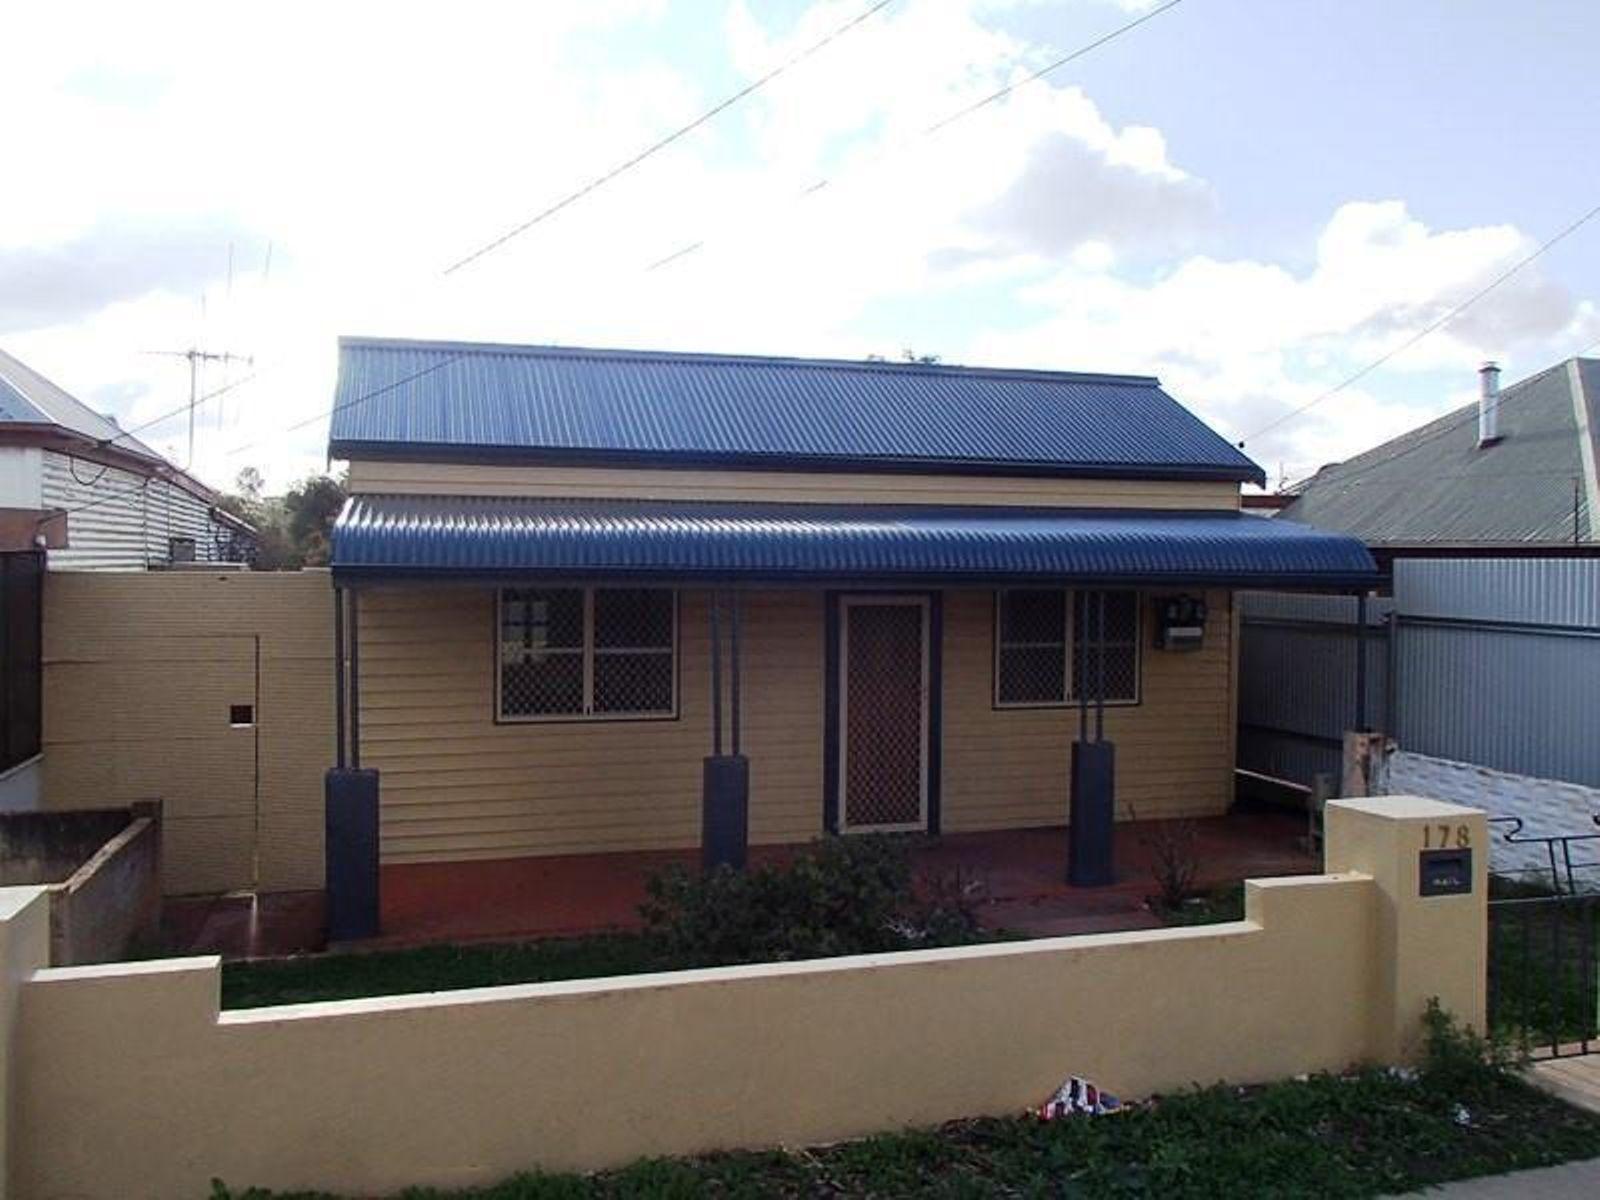 178 Williams Street, Broken Hill, NSW 2880